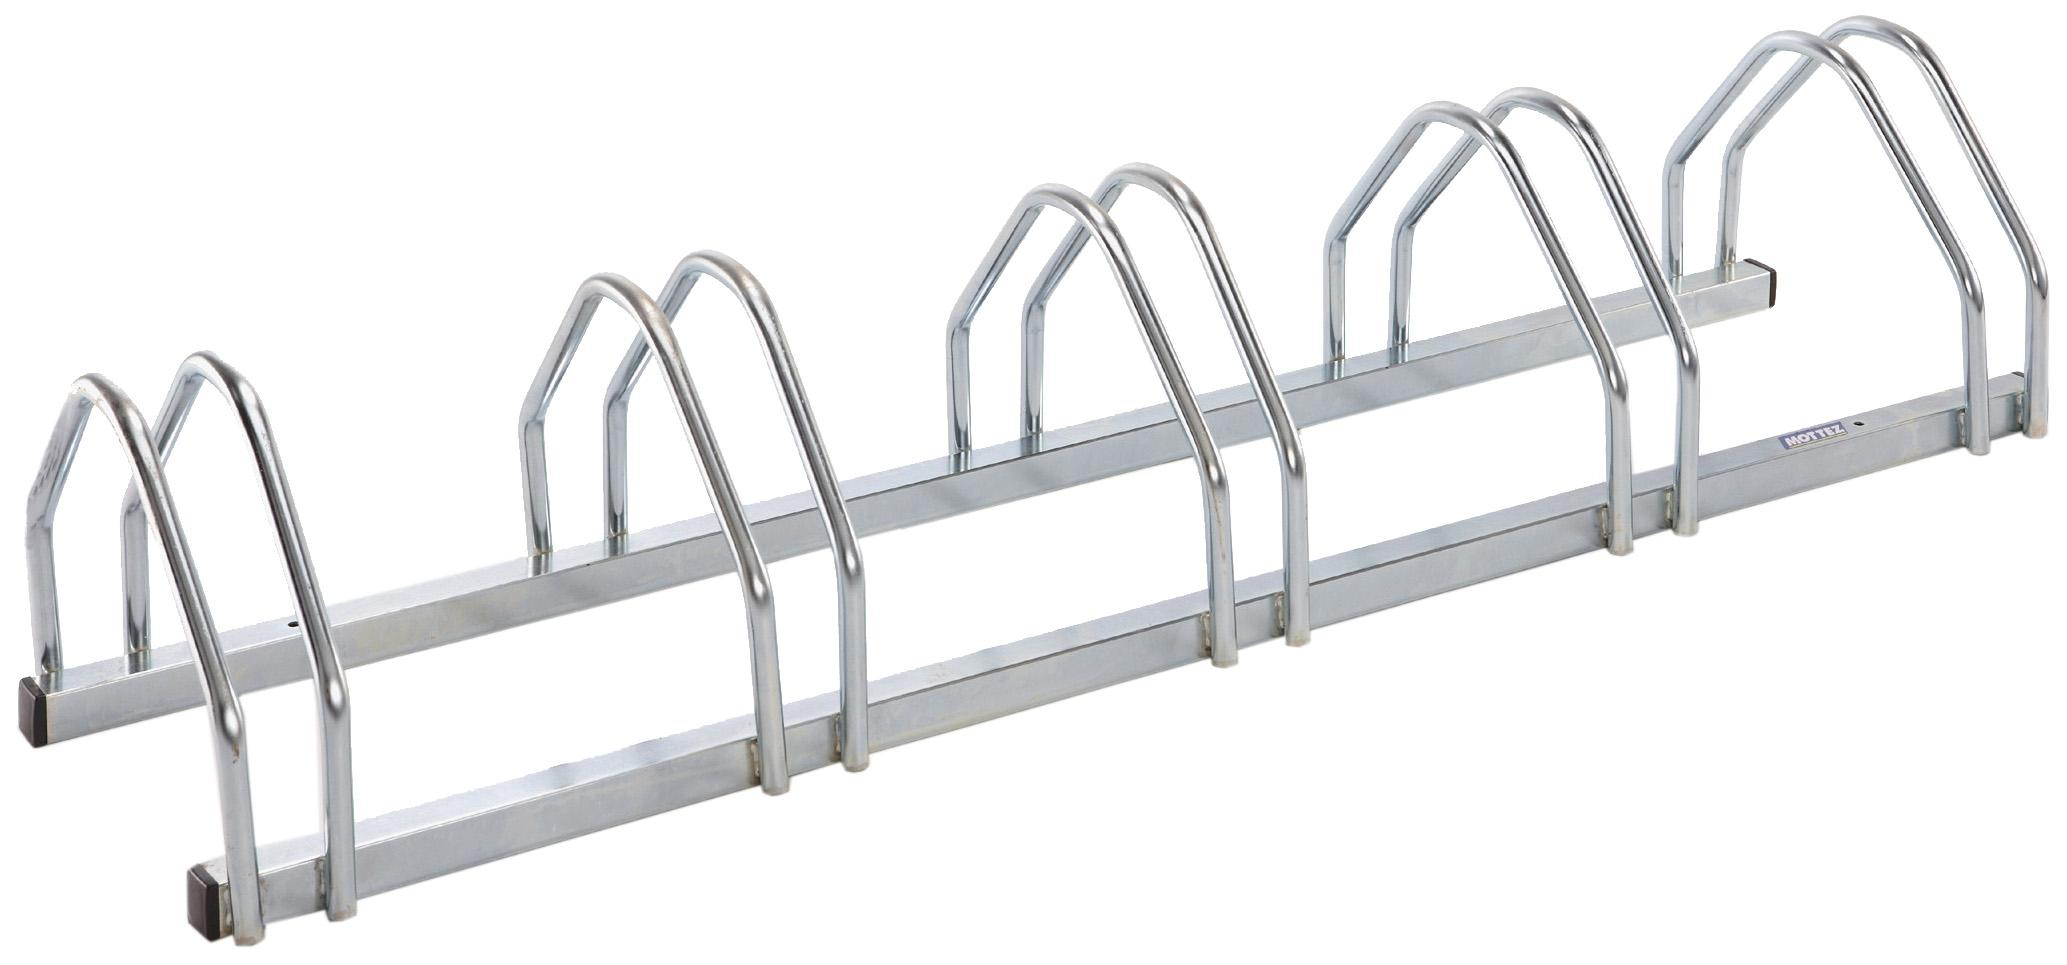 Mottez Bike Rack Stand